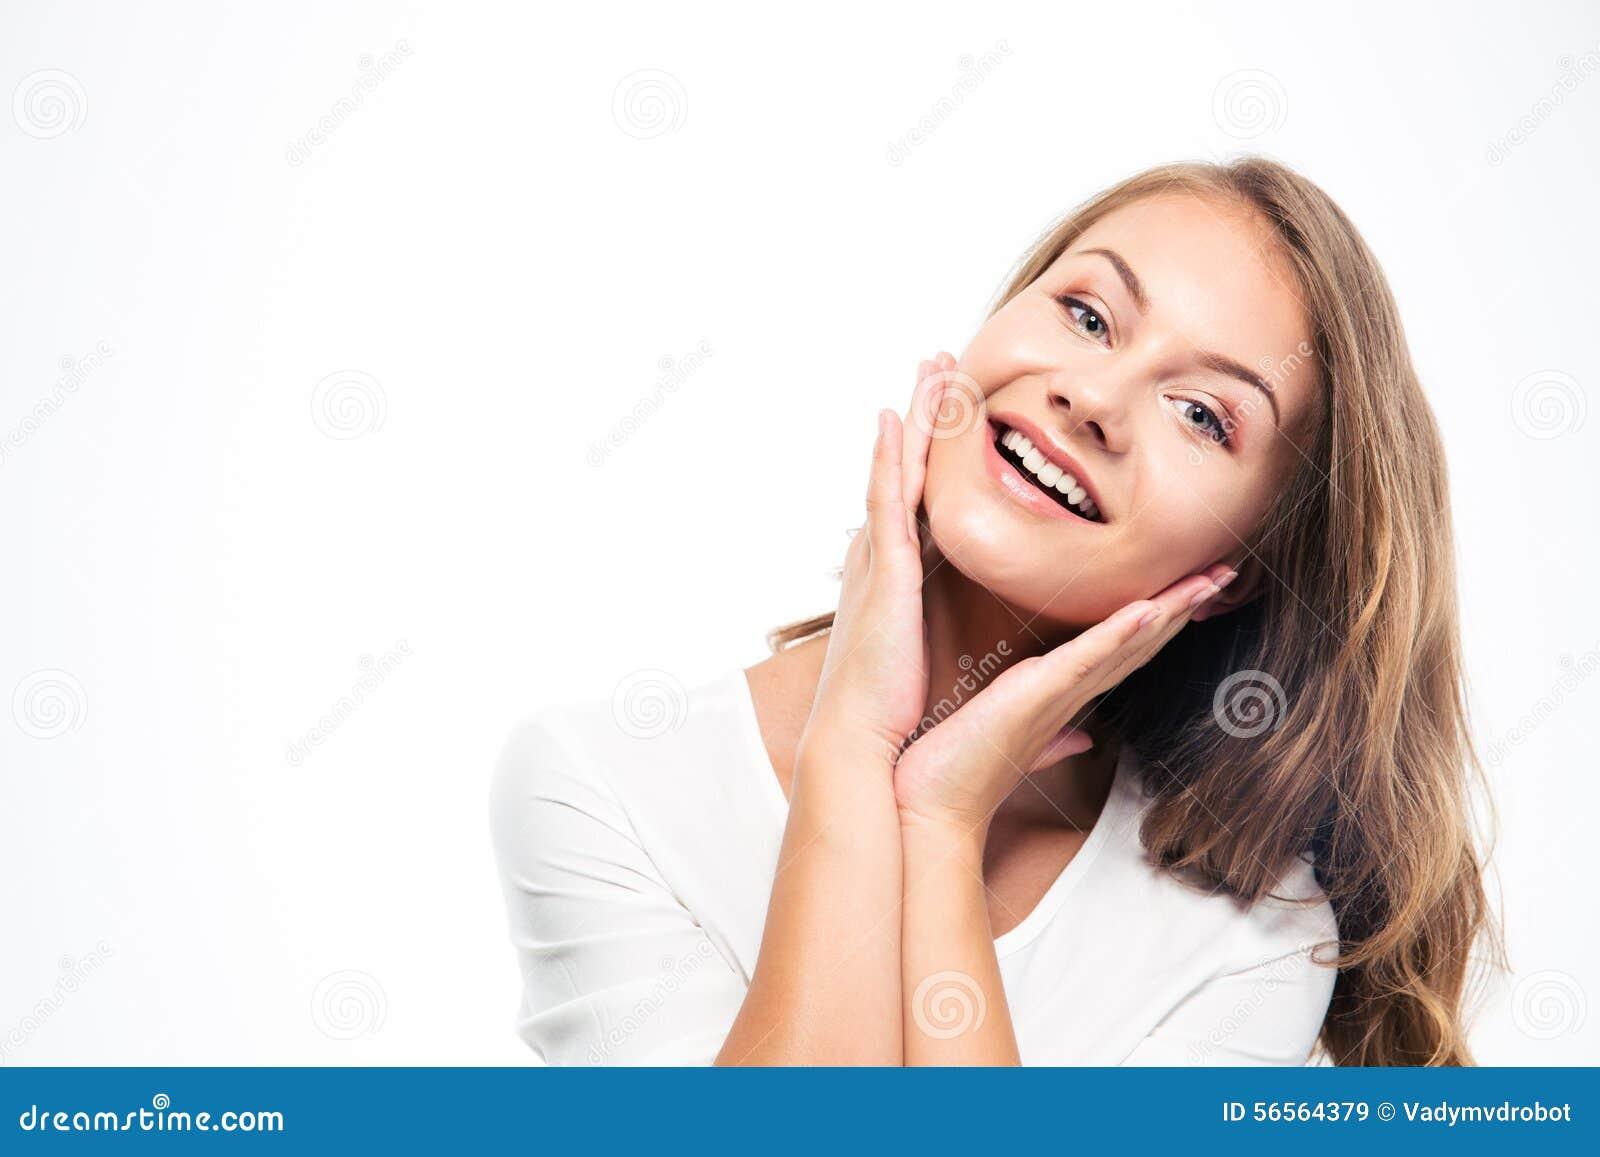 Download 2 200mm 70 8l καλυμμένες χαμογελώντας Usm νεολαίες γυναικών κανόνων φ πορτρέτο Στοκ Εικόνα - εικόνα από χαριτωμένος, καλός: 56564379